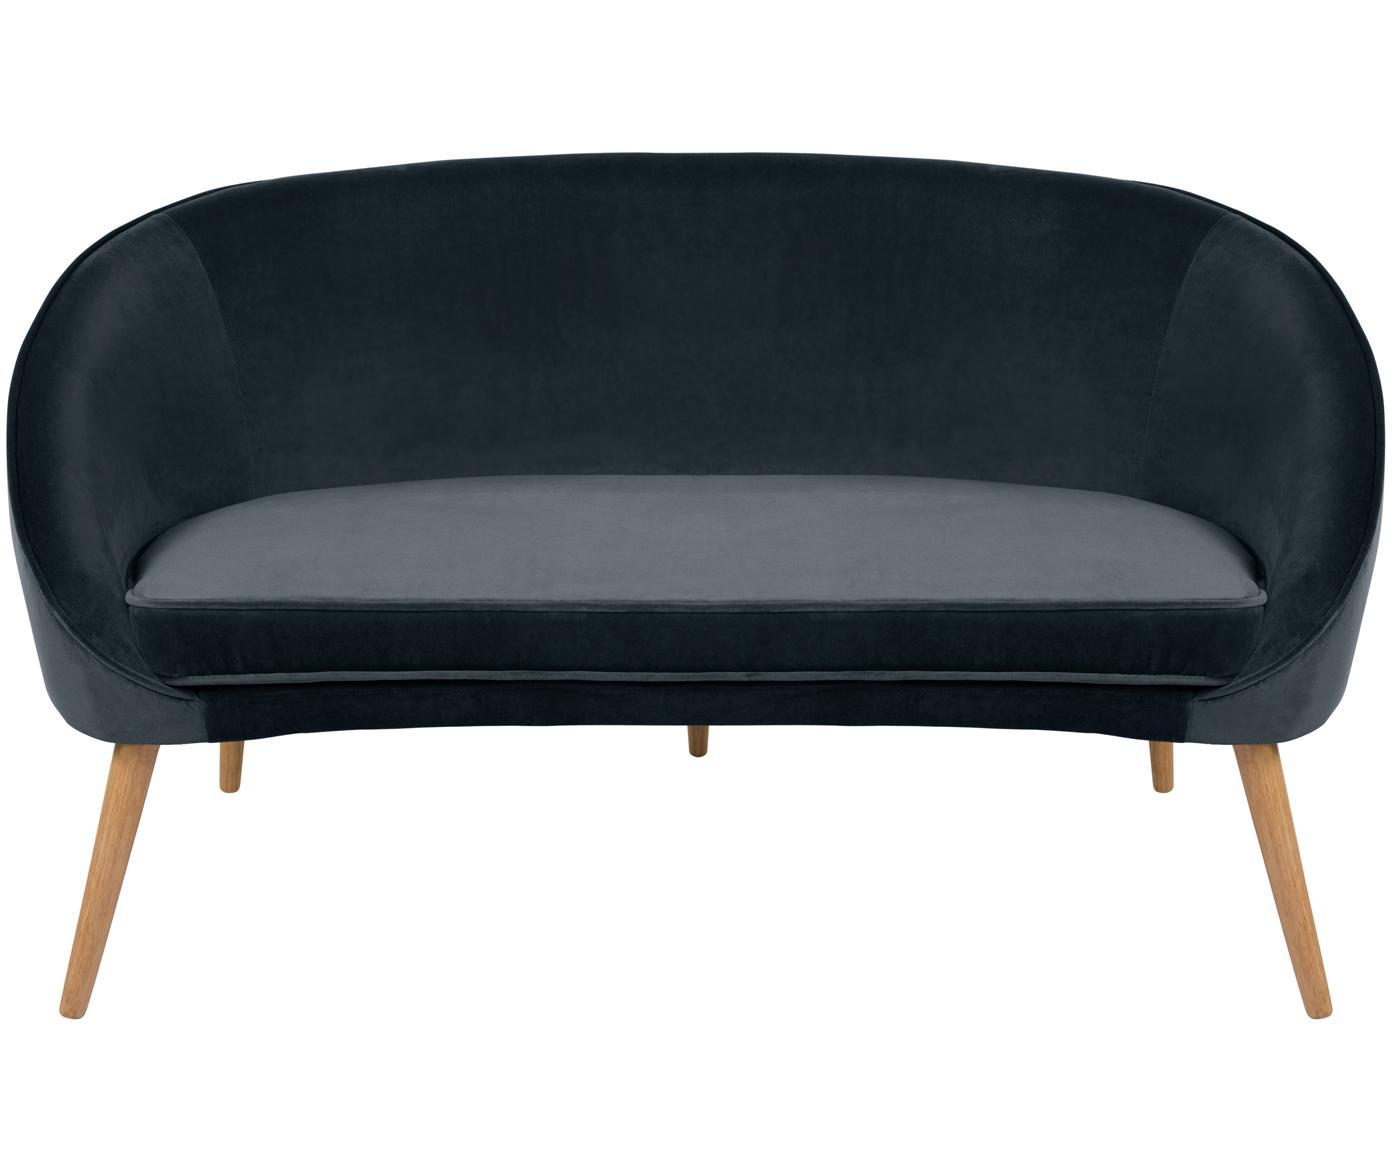 Fluwelen sofa Safir (2-zits), Bekleding: polyester fluweel, Poten: gebeitst walnoothout, Donkergrijs, B 136  x D 66 cm